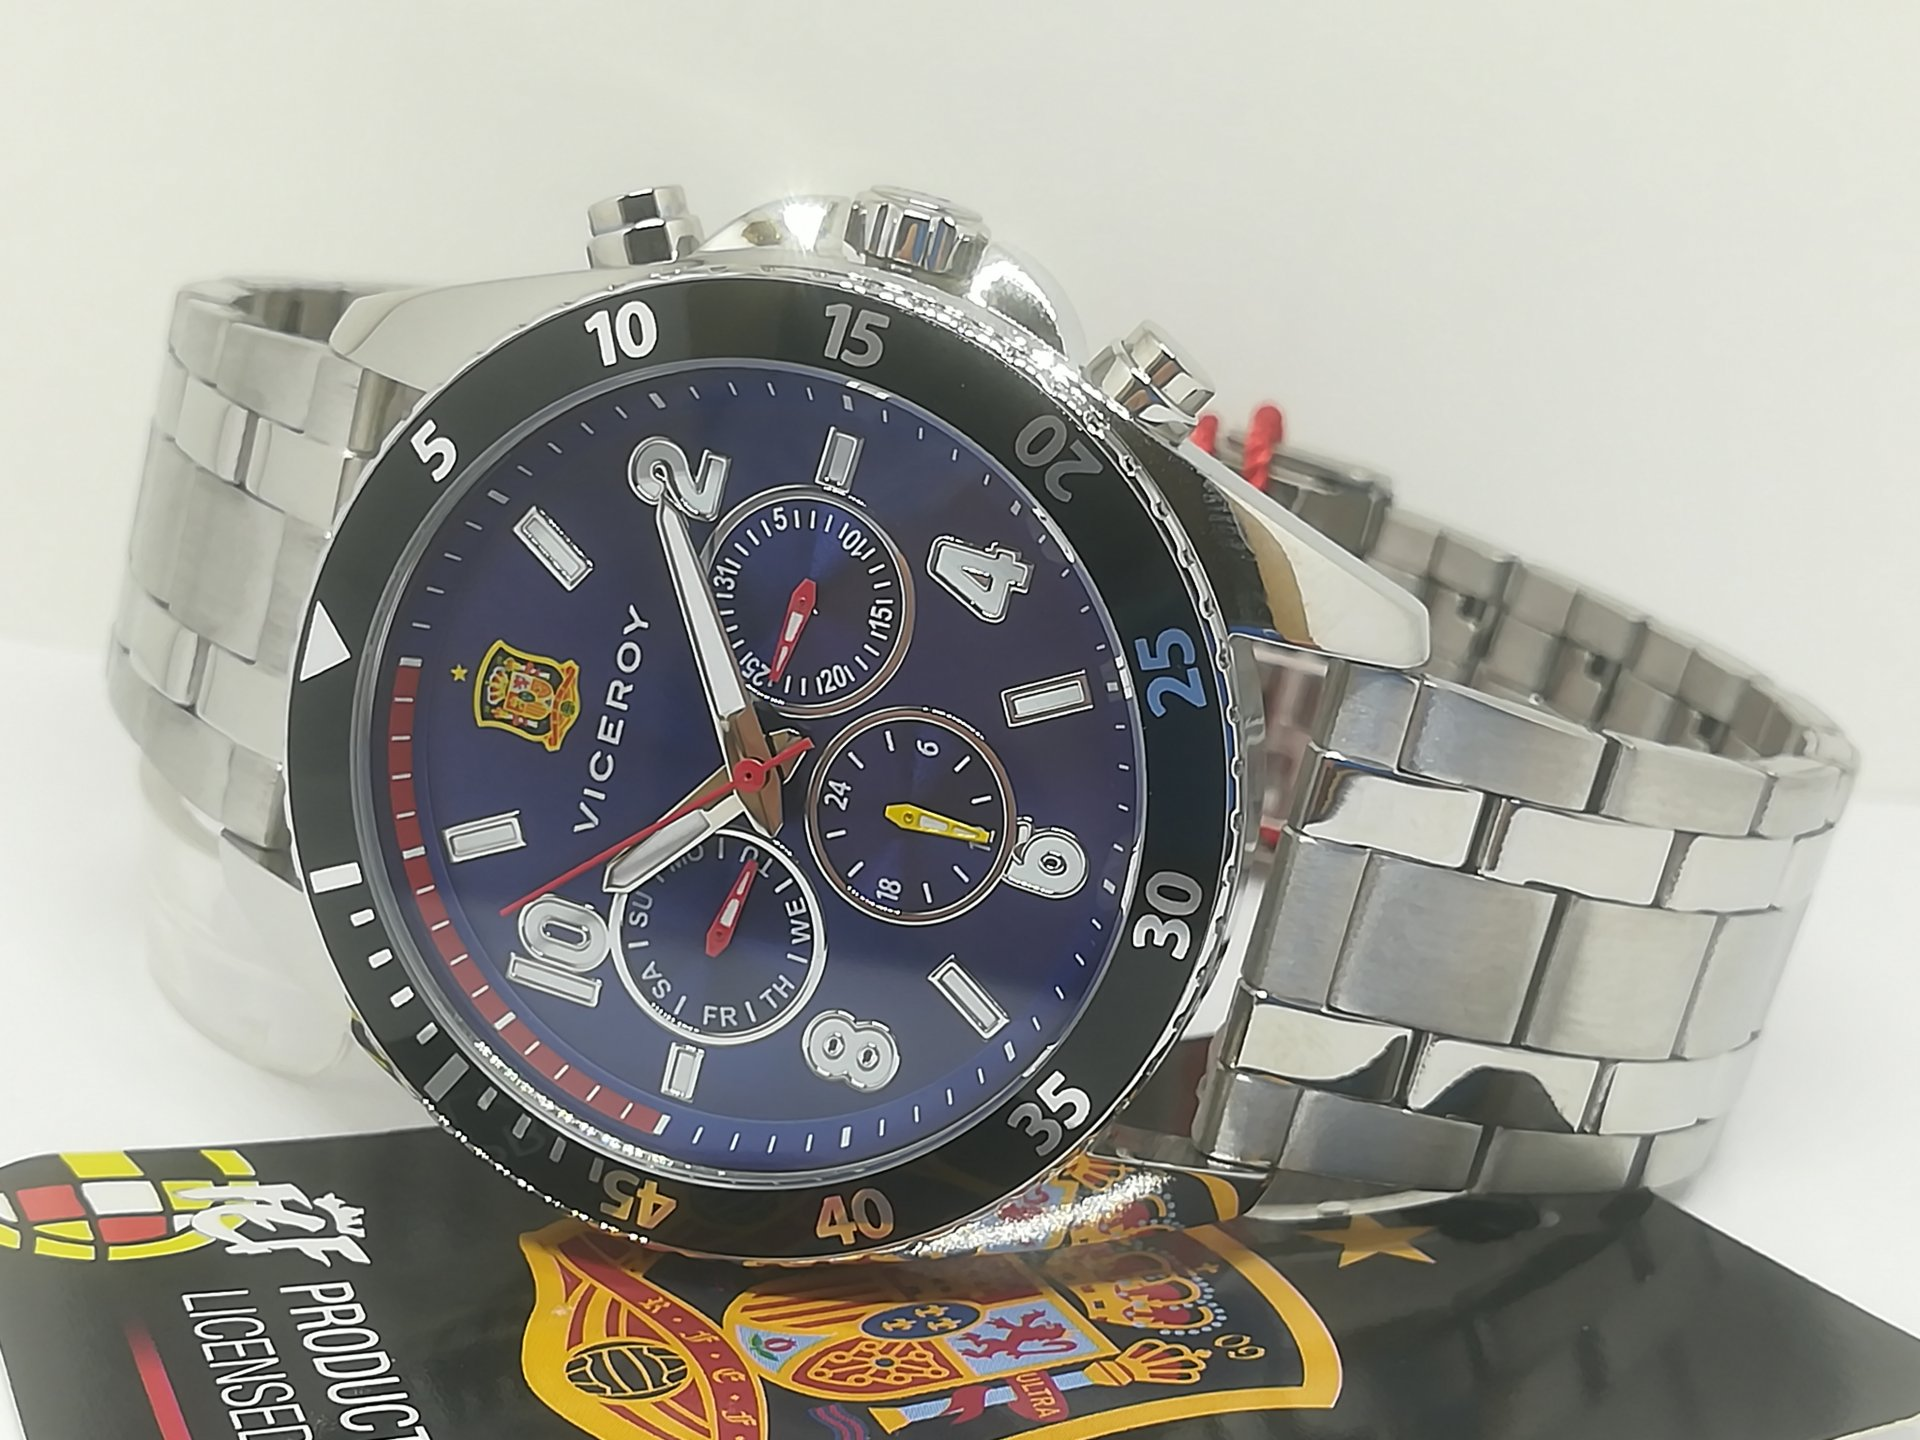 Reloj Viceroy Seleccion Española 42341-35 Oficial